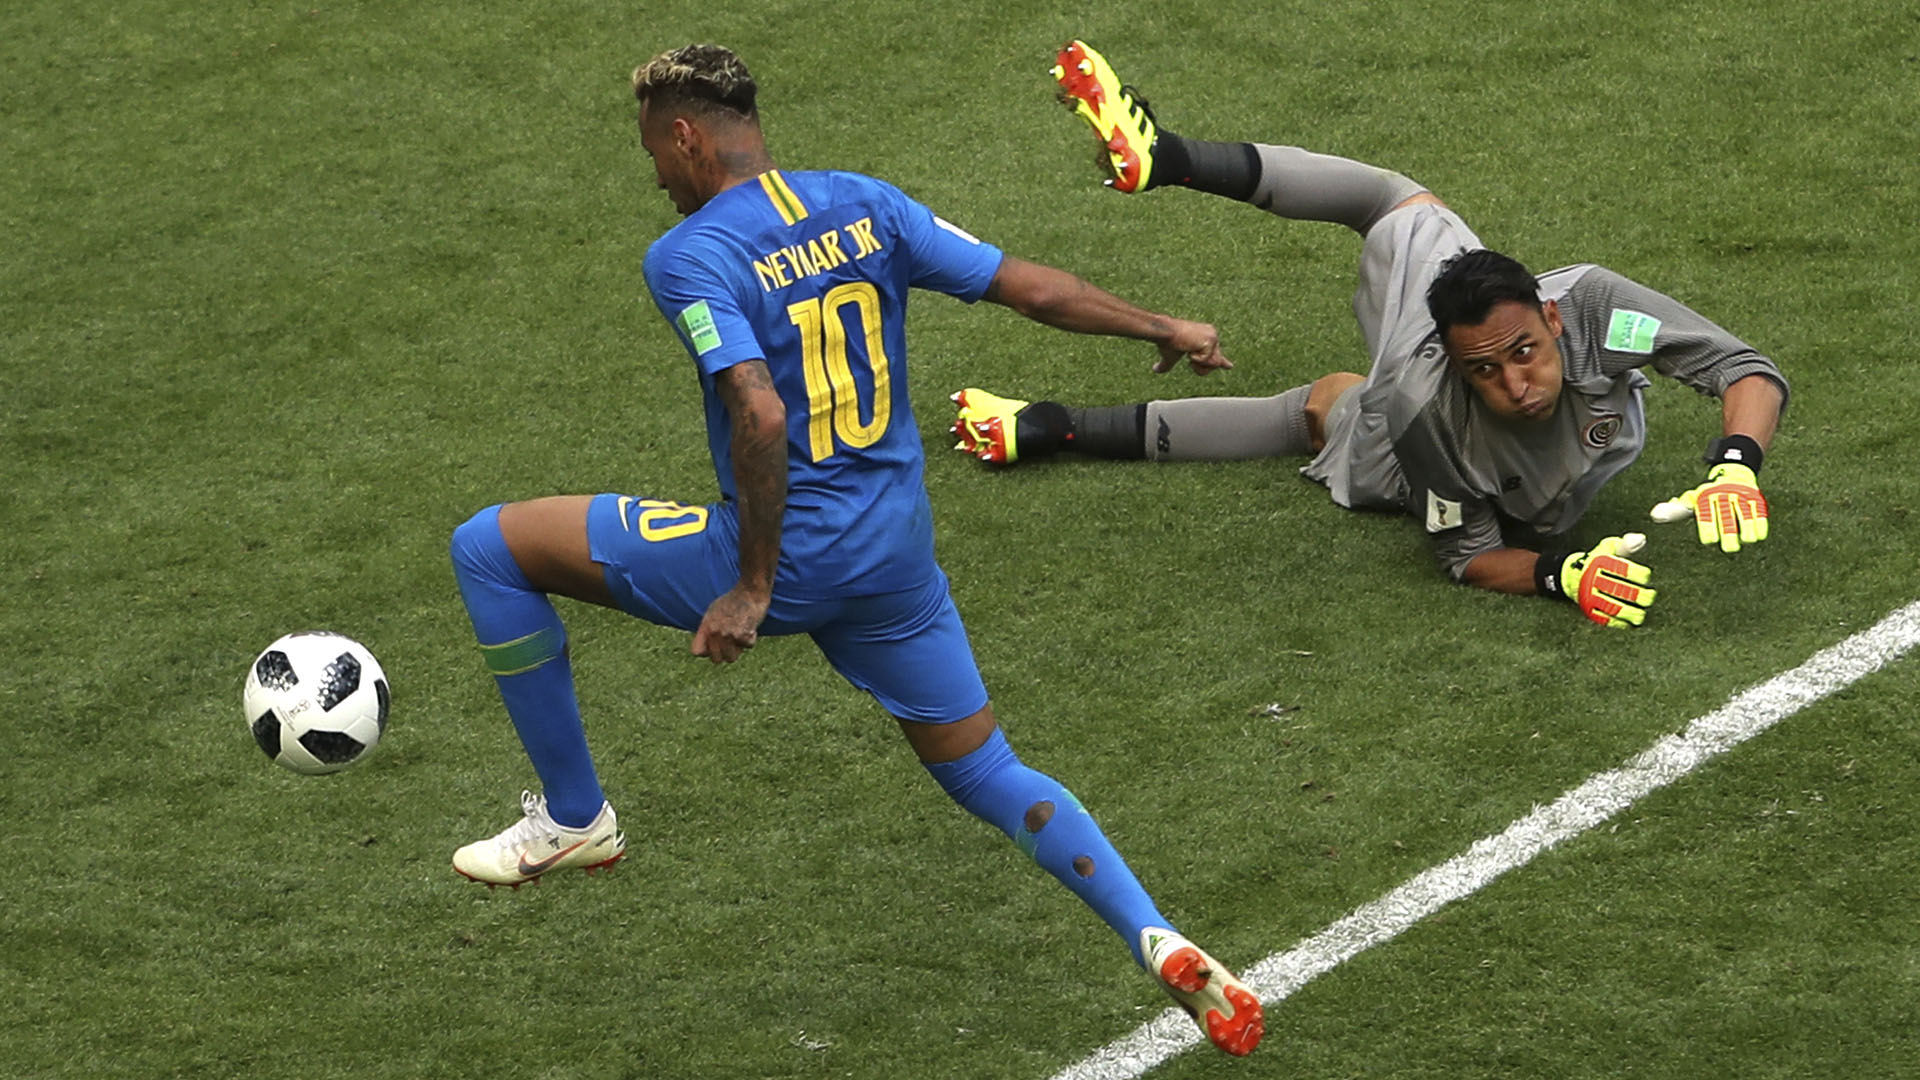 Neymar supera a Keylor Navas